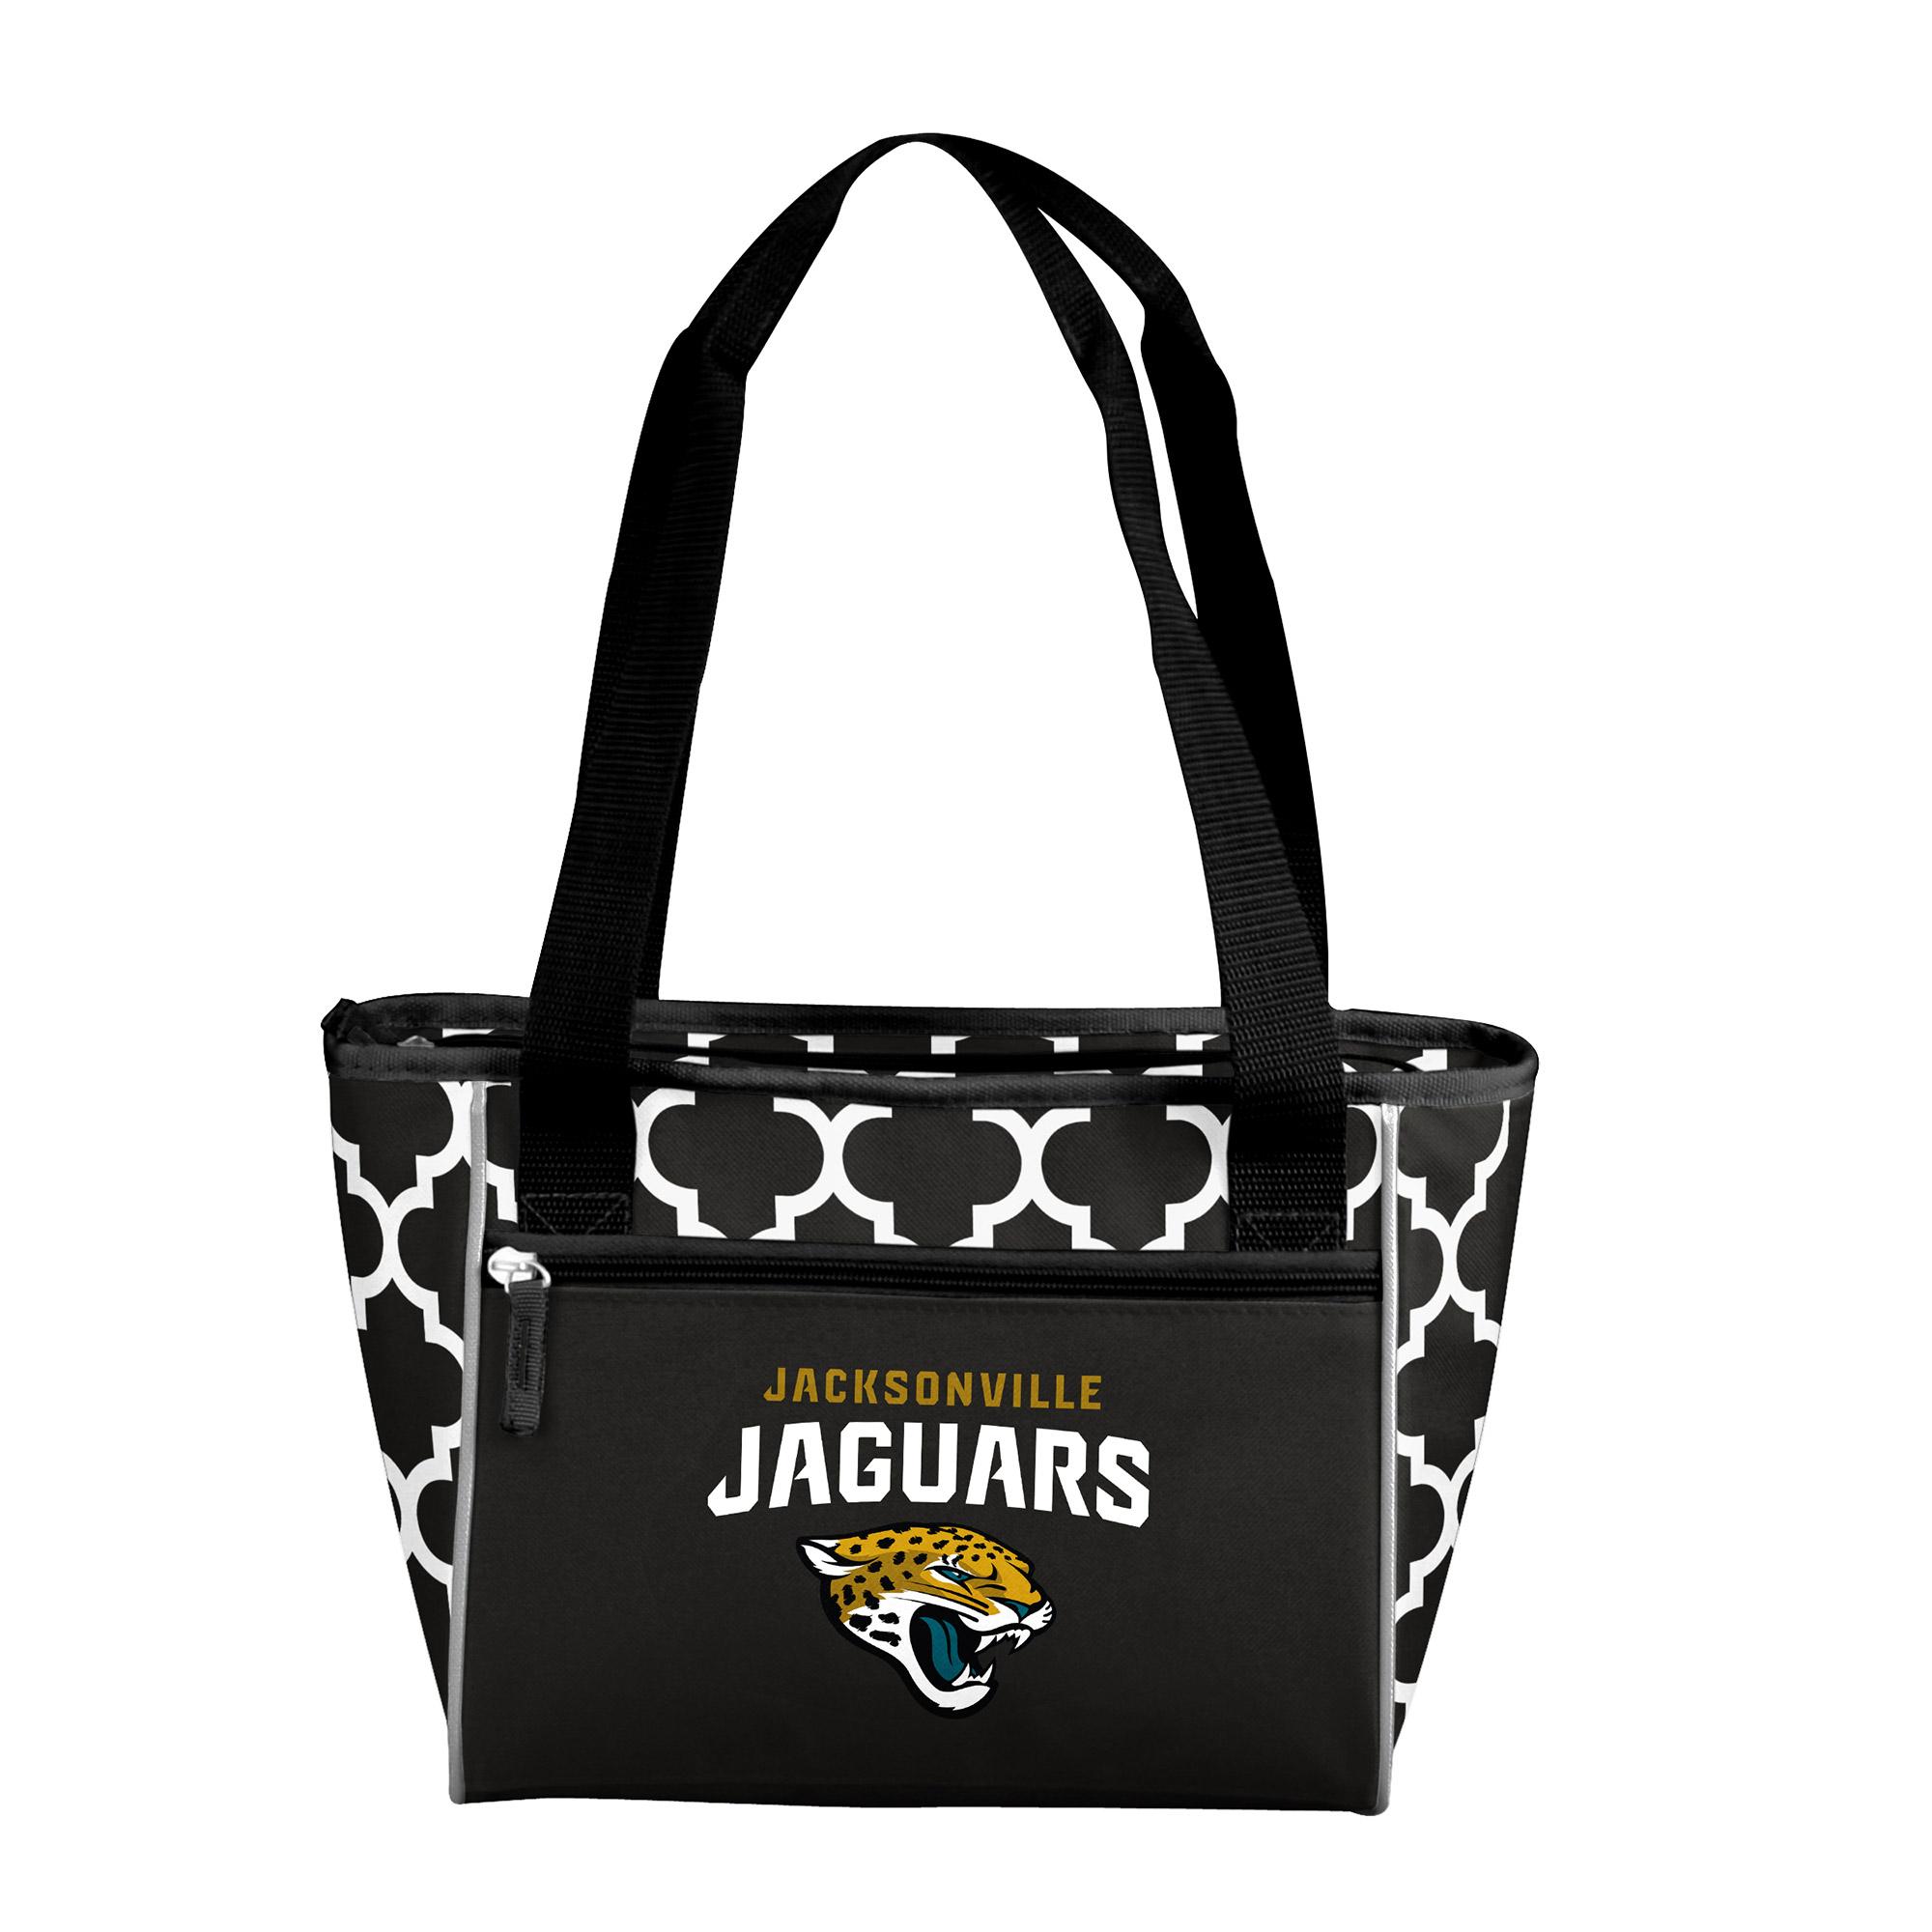 Jacksonville Jaguars Quatrefoil 16 Can Cooler Tote